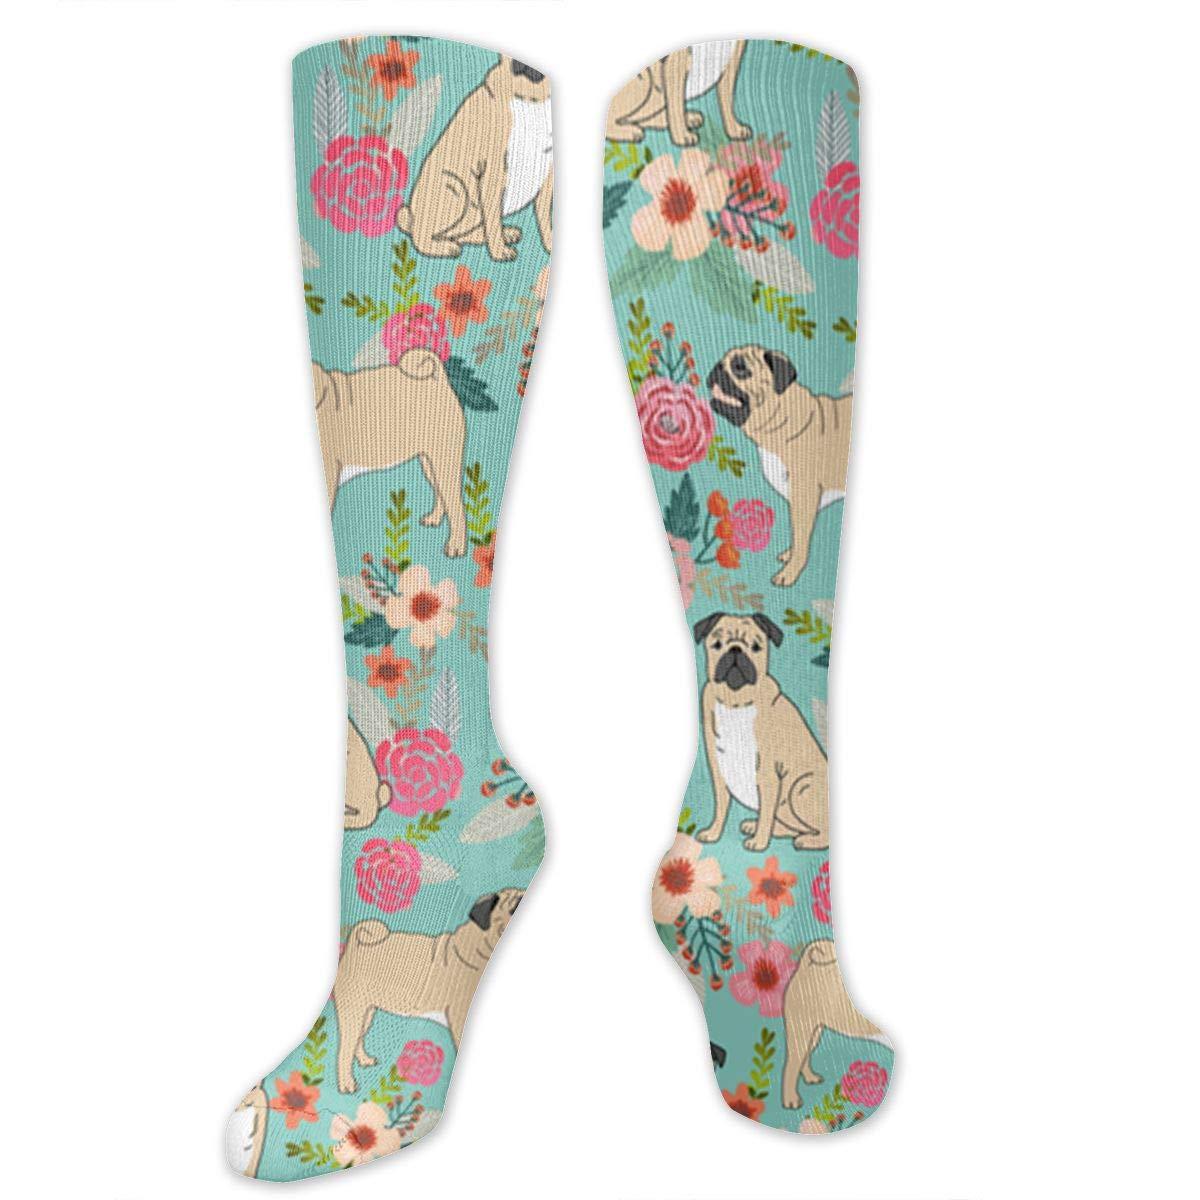 Men Multicolored Pattern Fashionable Fun Crew Cotton Socks Chanwazibibiliu Pug Spring Mint Mens Colorful Dress Socks Funky